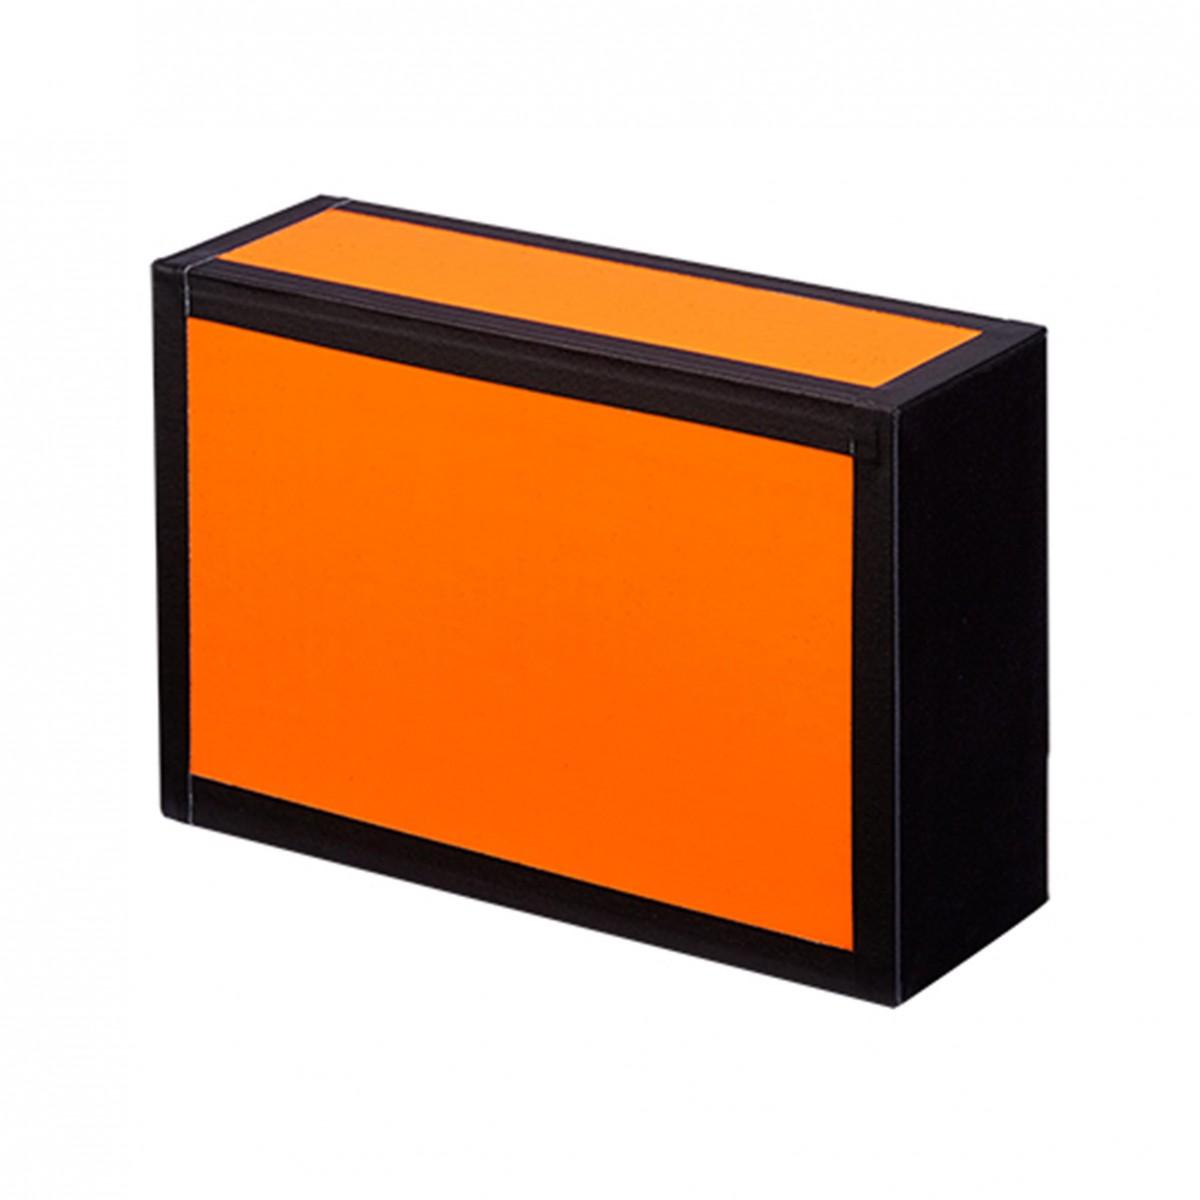 Cigar box Fluo x 1pz